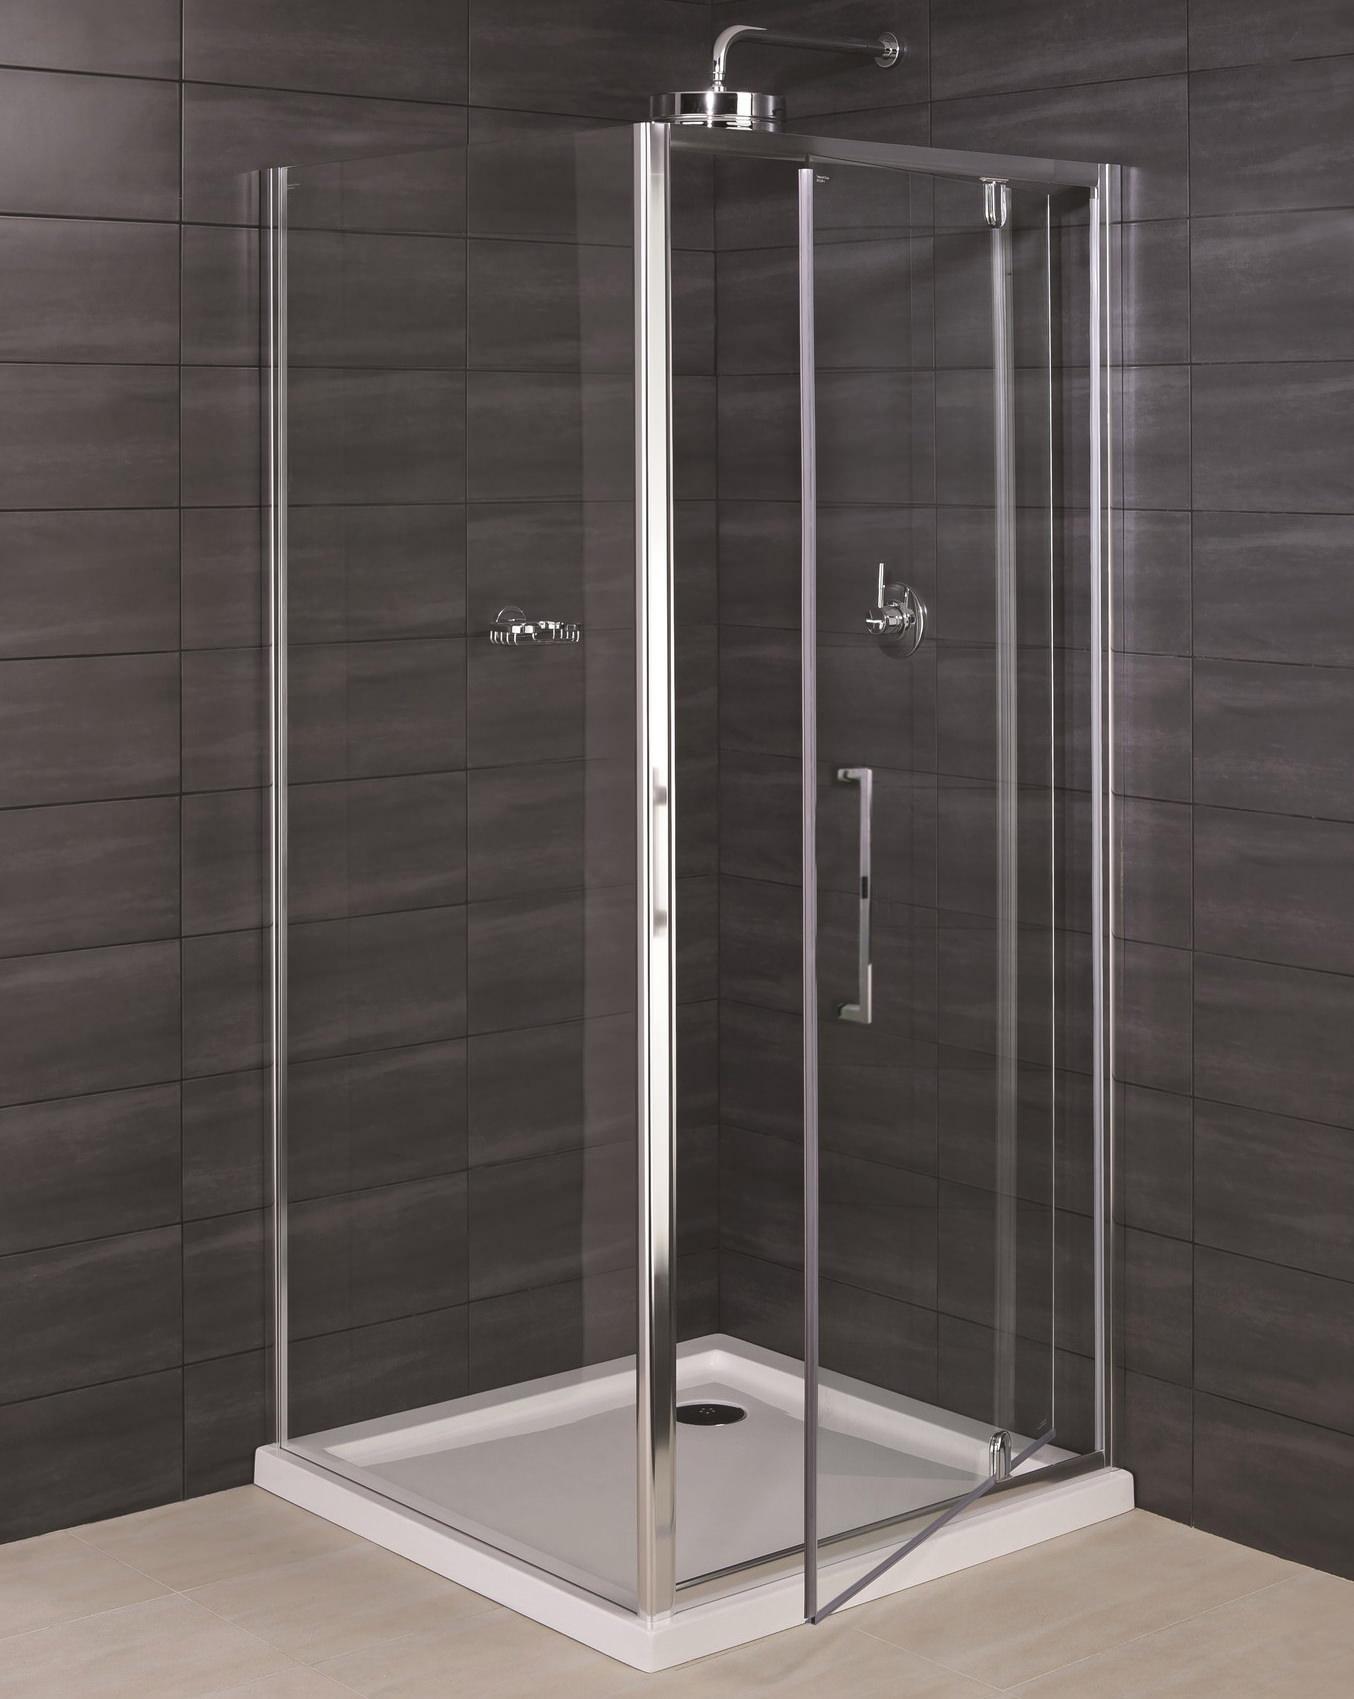 Shower Cubicle  Prayosha Enterprise Ltd.